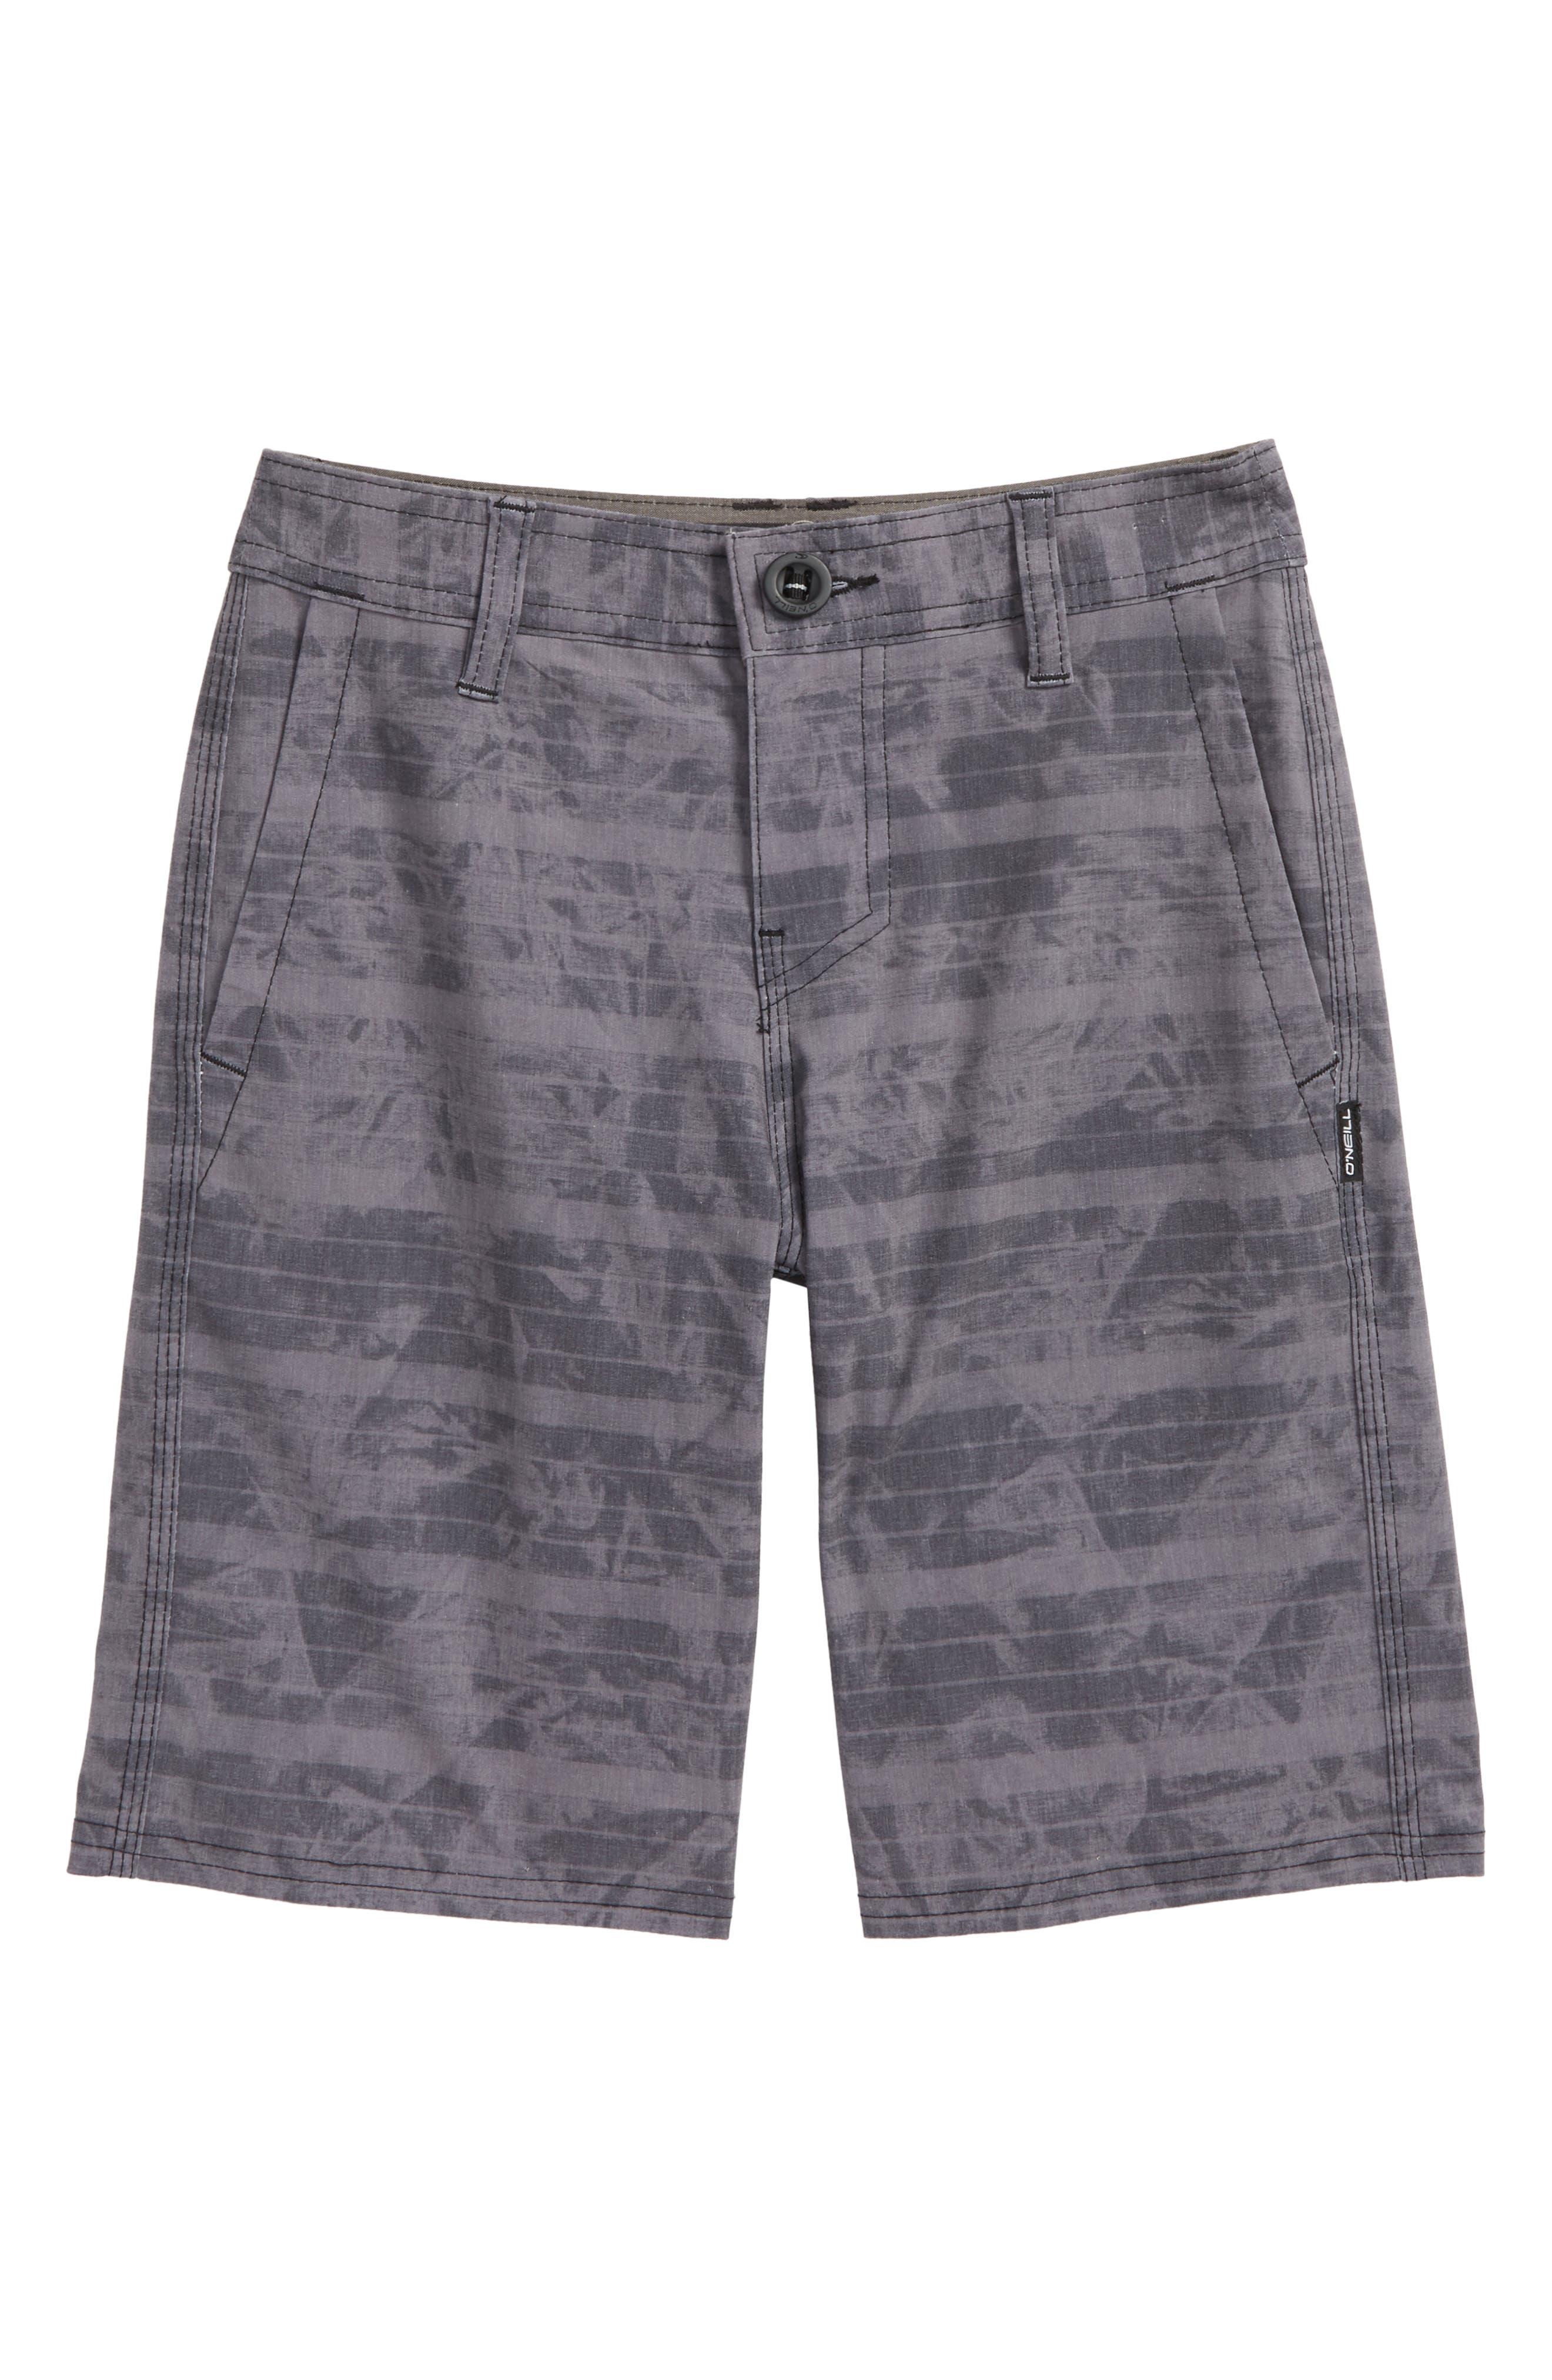 O'Neill Mischief Hybrid Shorts (Big Boys)